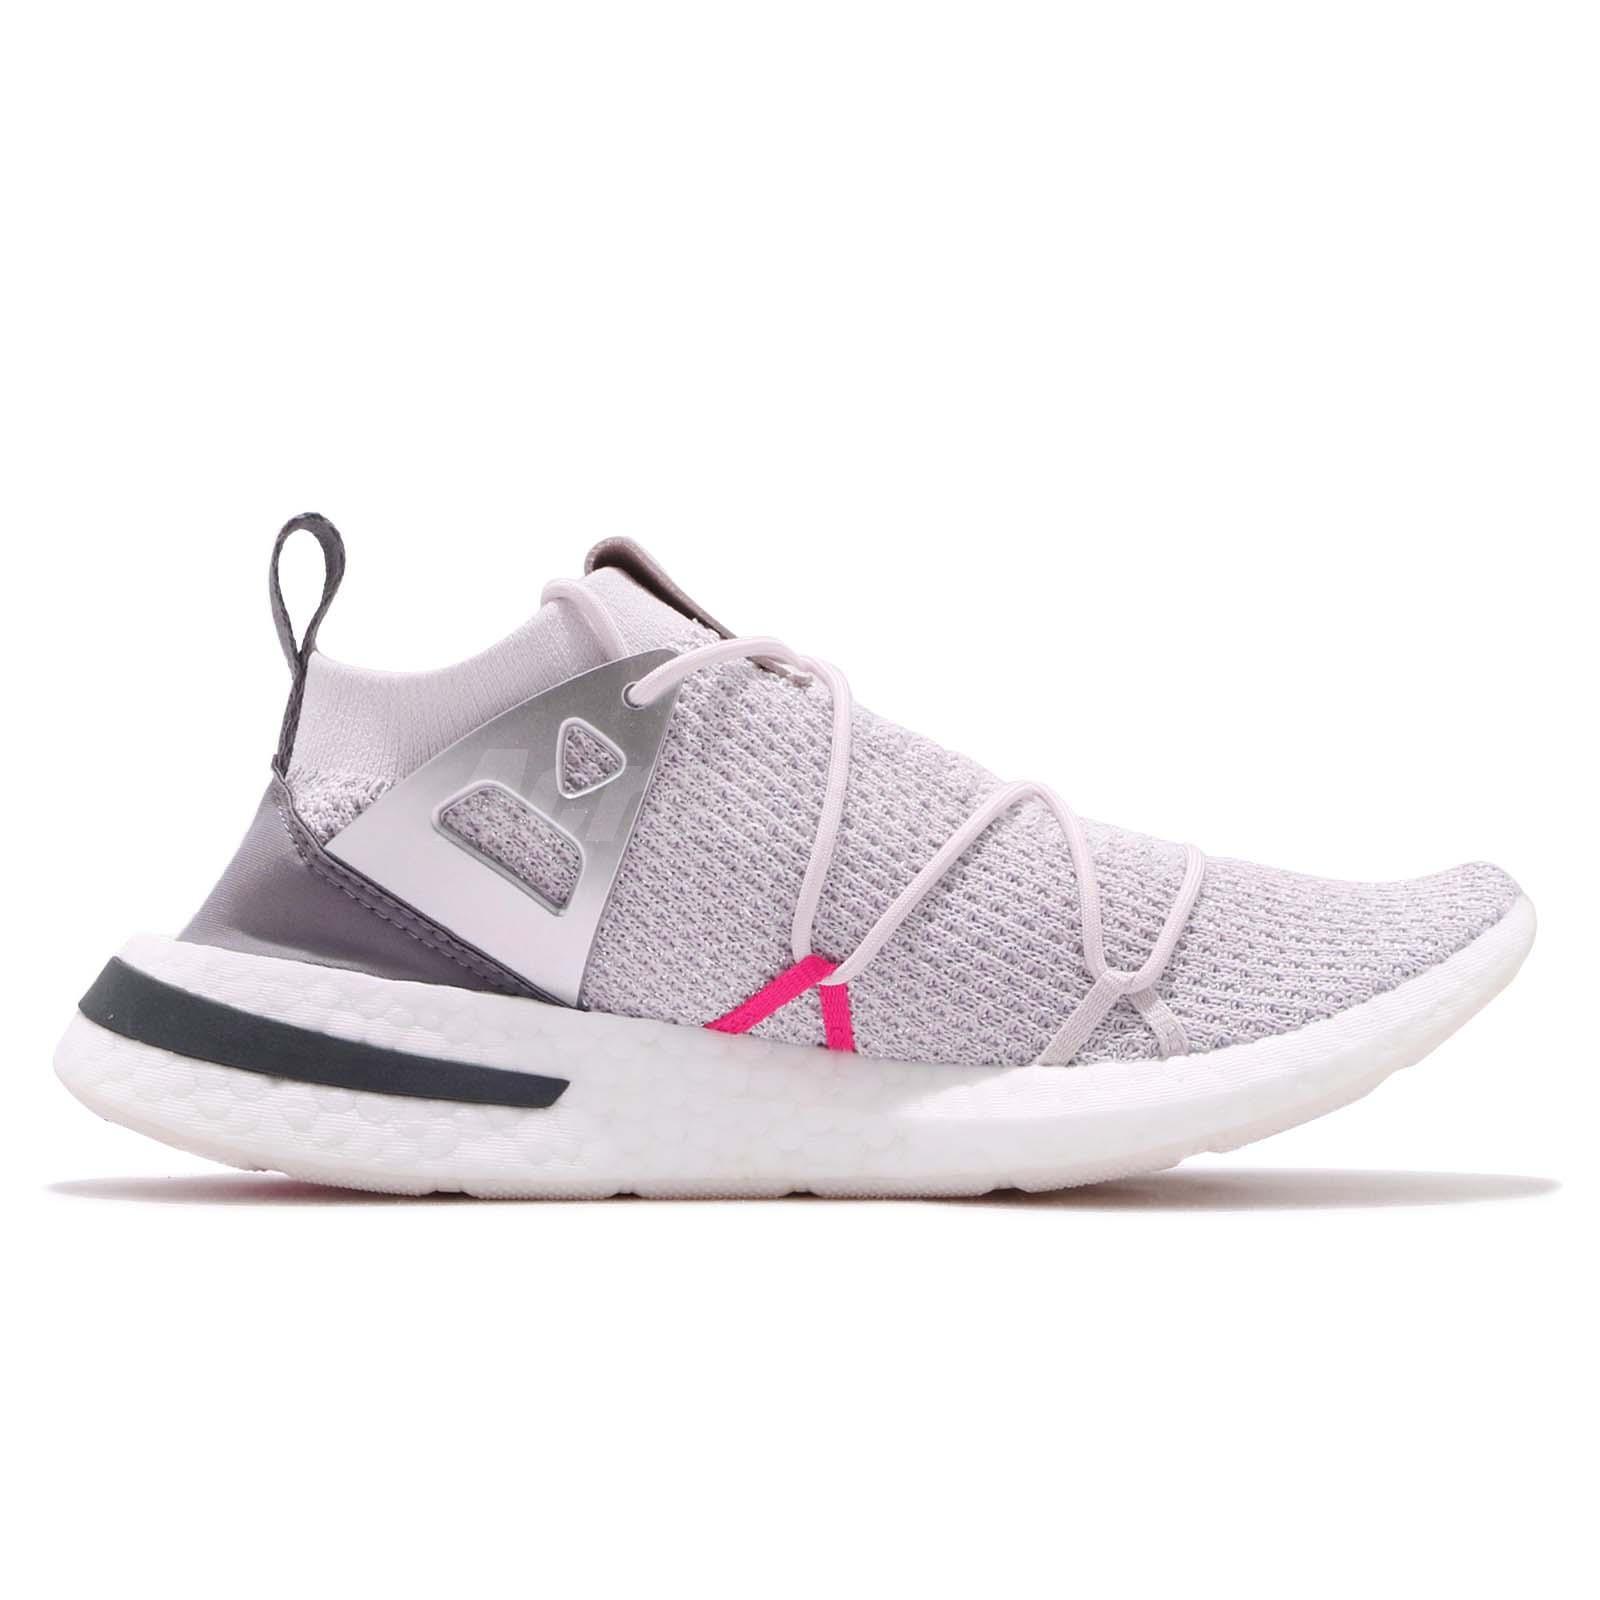 3ec13b63af0 adidas Originals ARKYN PK W Primeknit Boost Orchid Tint Women Shoes ...